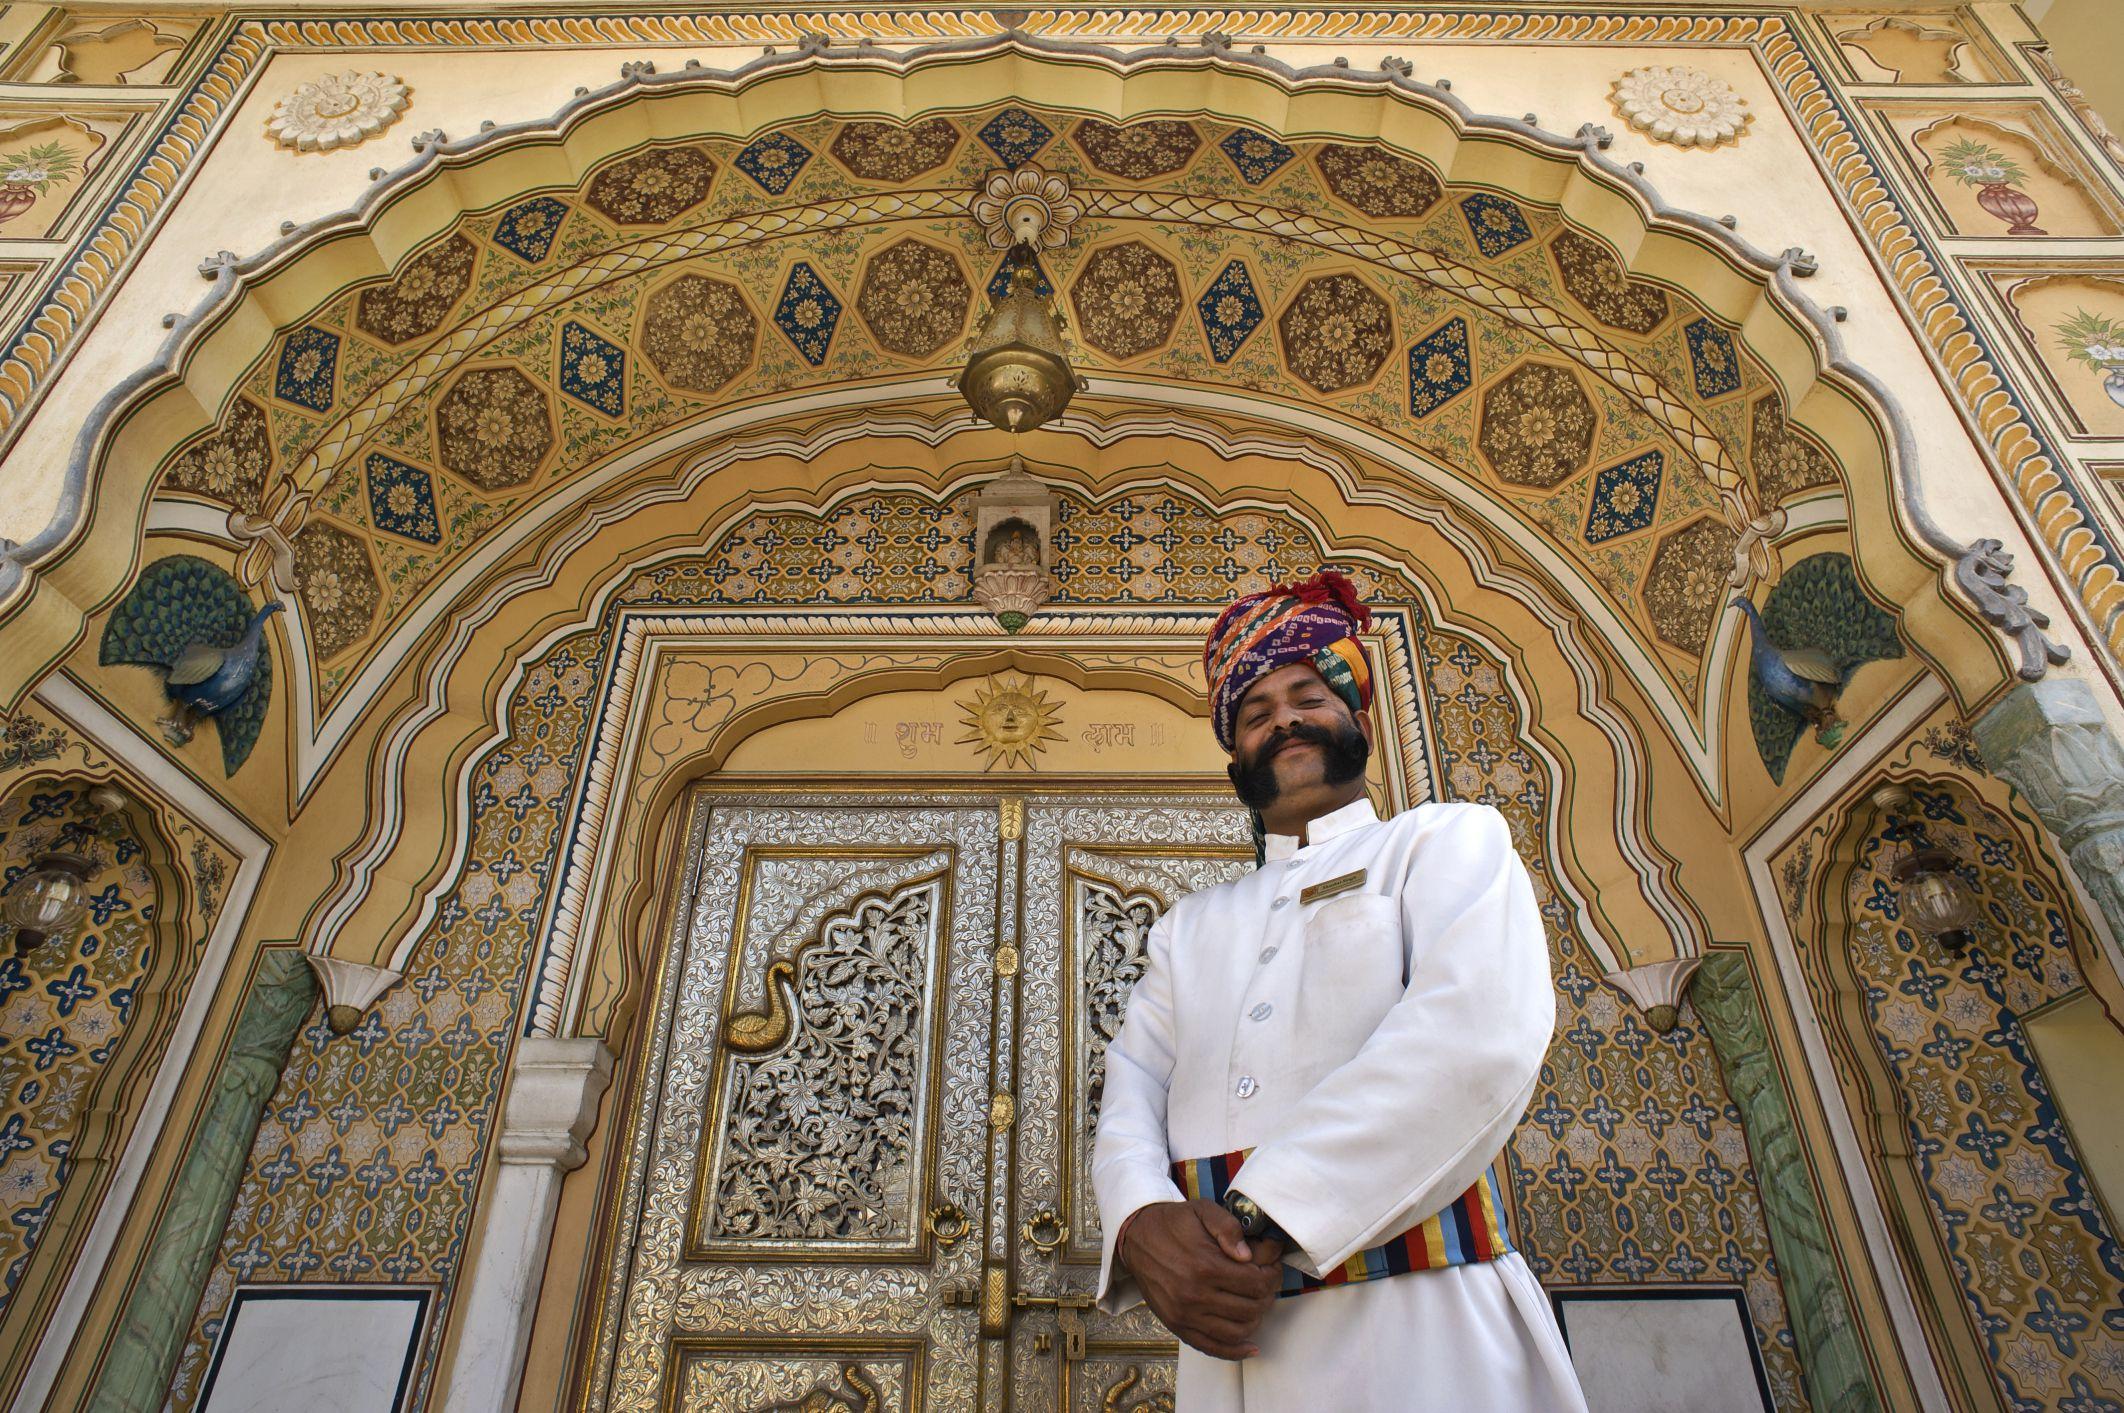 Palace hotel in Jaipur.